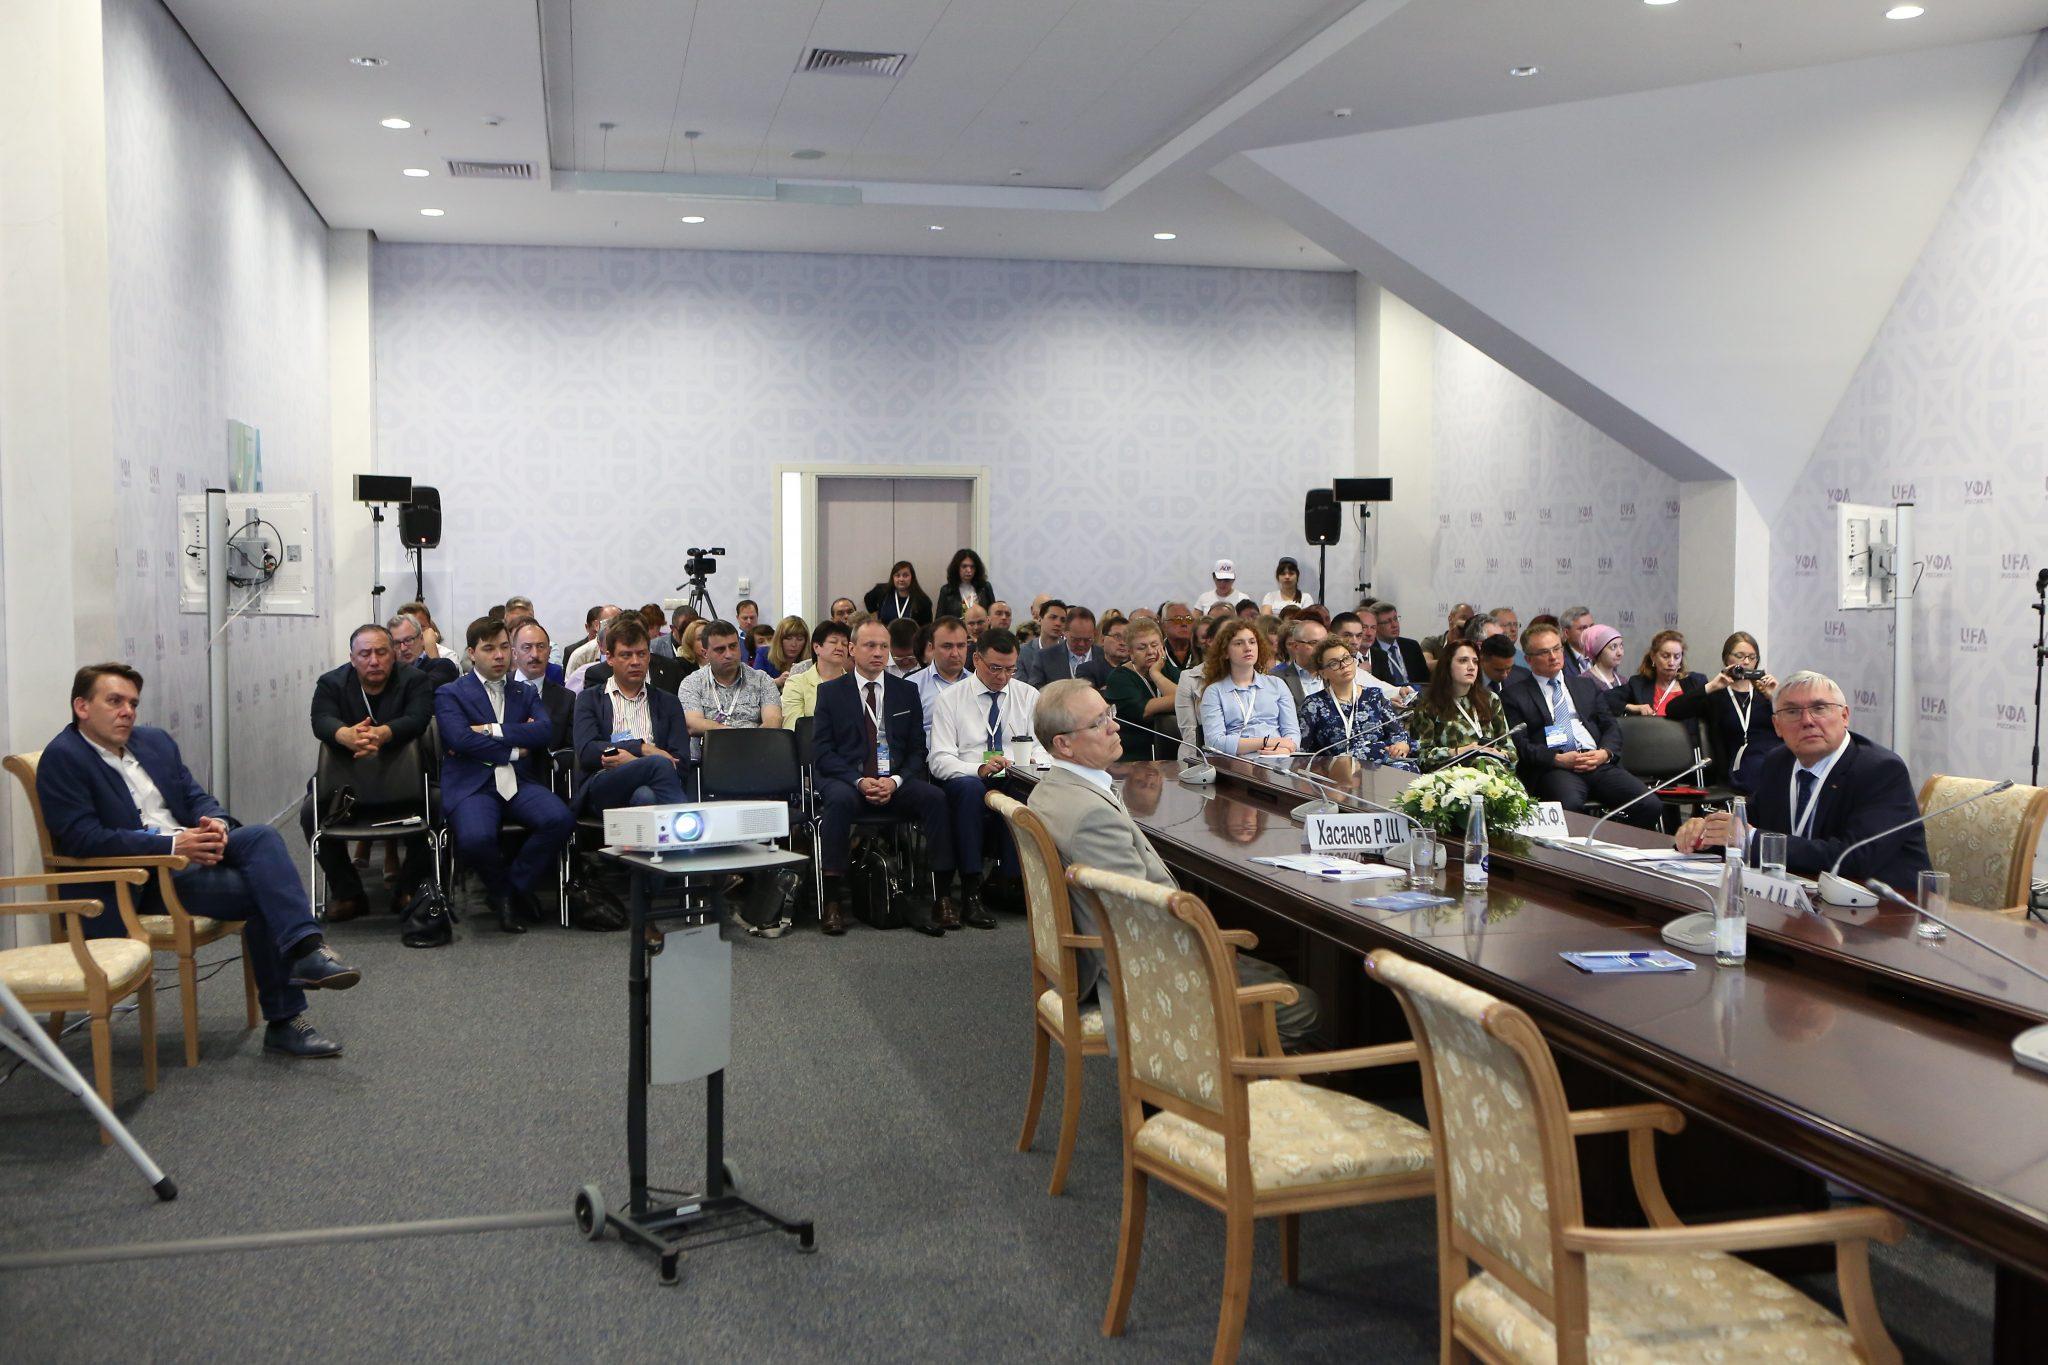 IX Съезд онкологов России